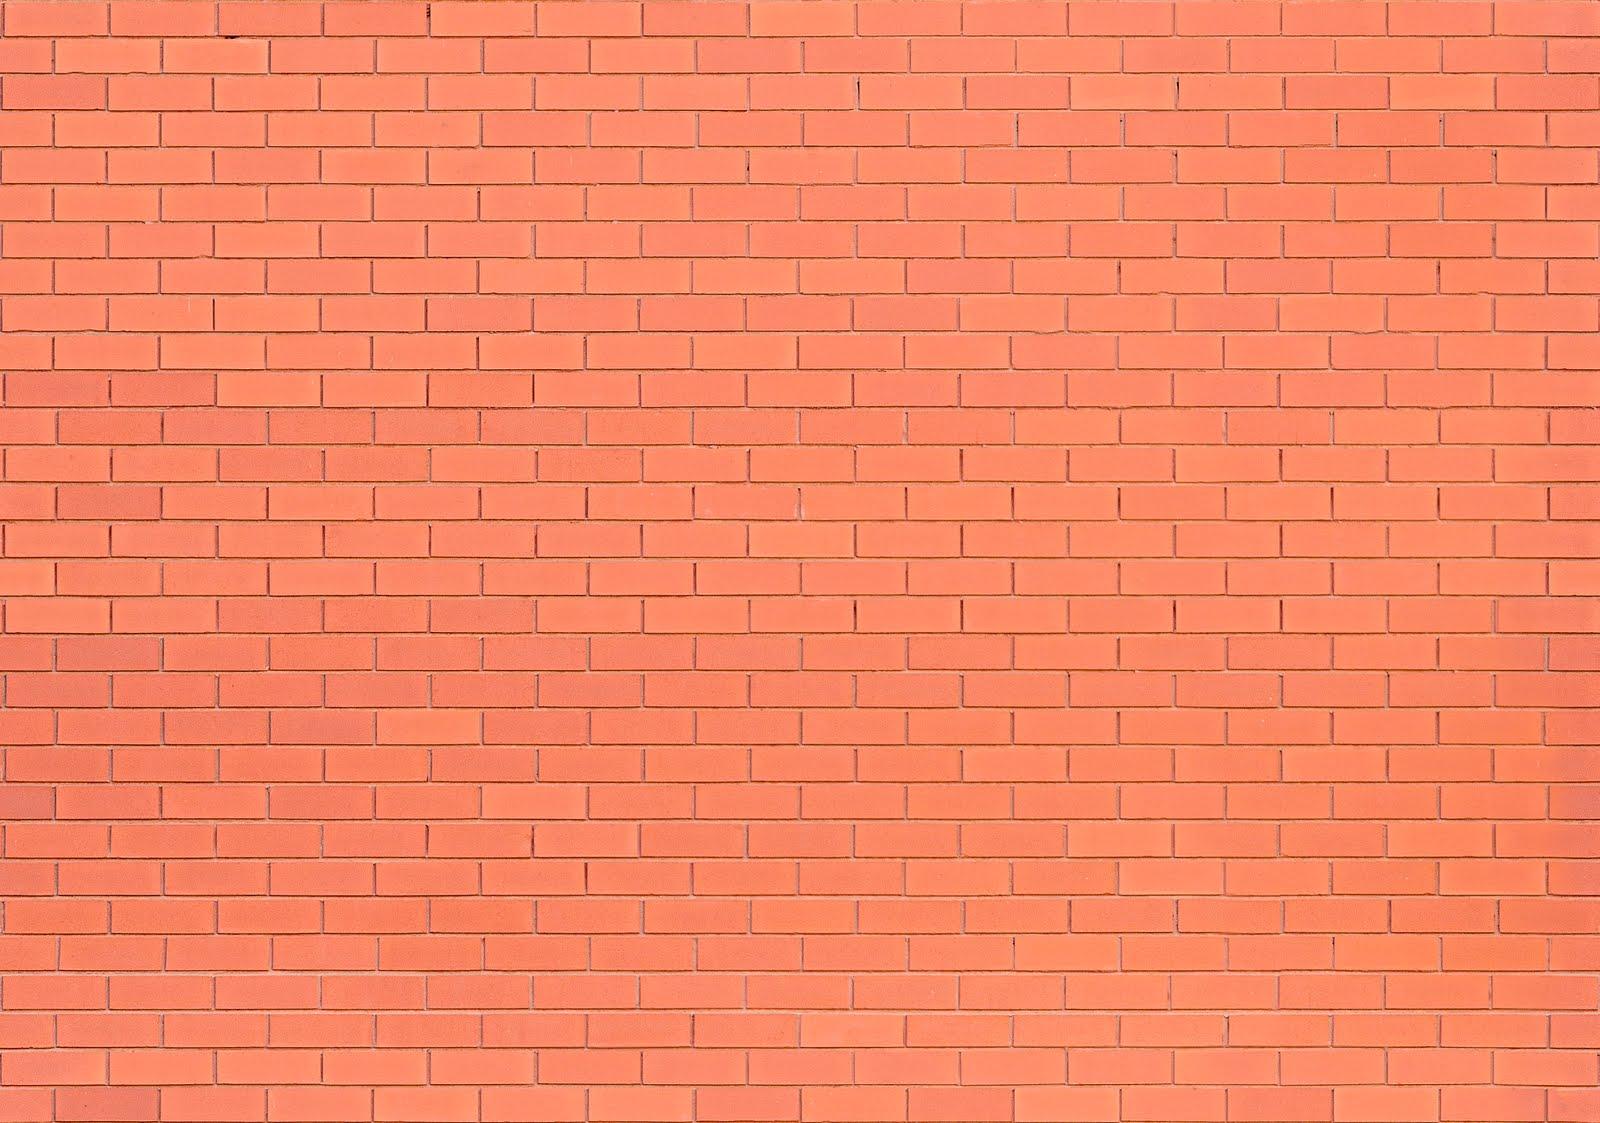 http://1.bp.blogspot.com/_DonZAd125Ac/TDUc3kh7poI/AAAAAAAAAEw/IFbNVJf8oLI/s1600/Orange_clean_brick_wall.jpg